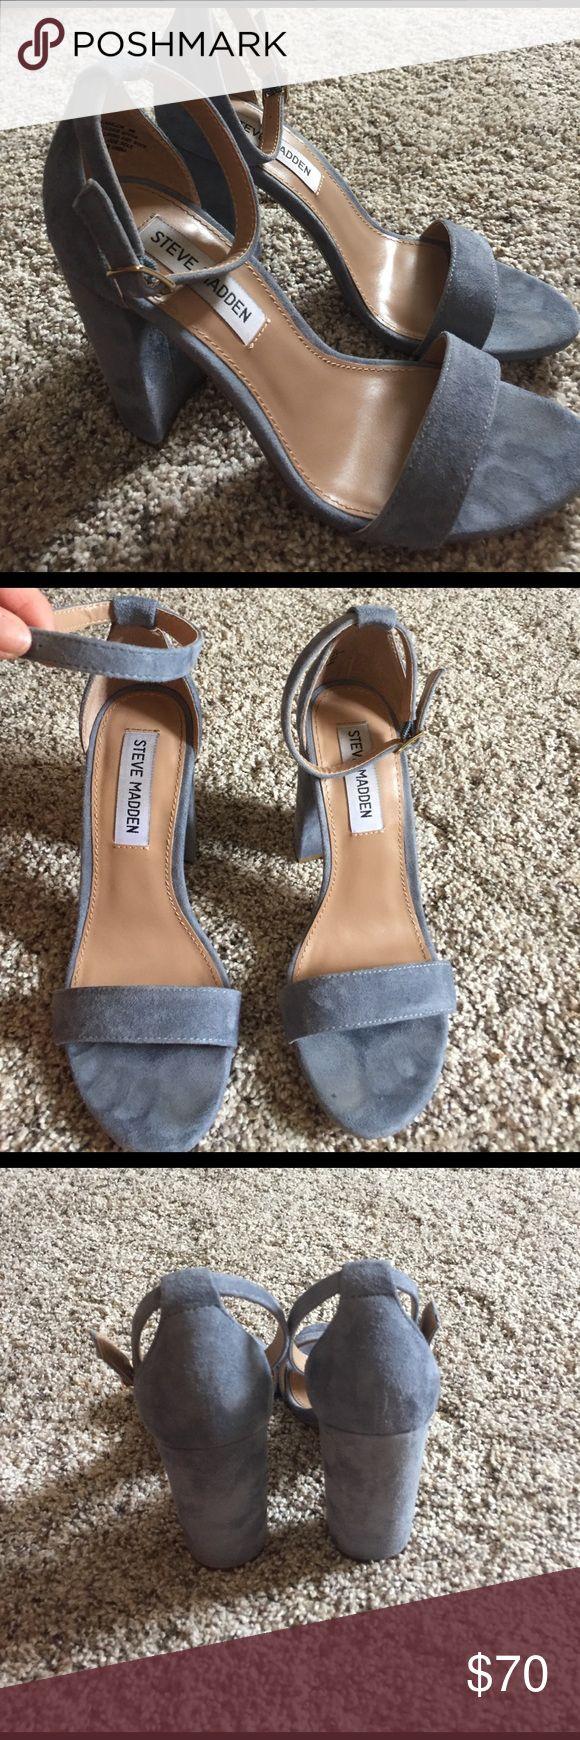 Steve Madden blue suede heels Super cute for spring! A great neutral heel! Steve Madden Shoes Sandals